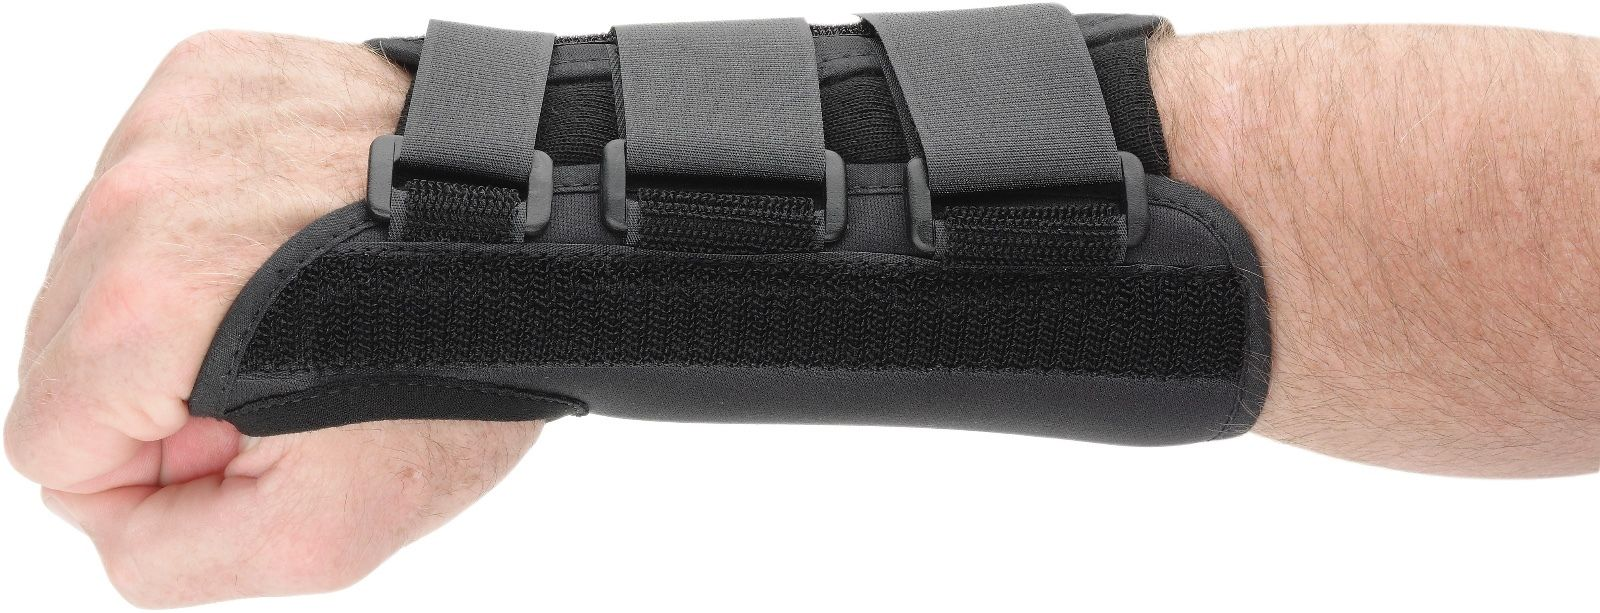 Ossur (317087) Wrist Brace 8